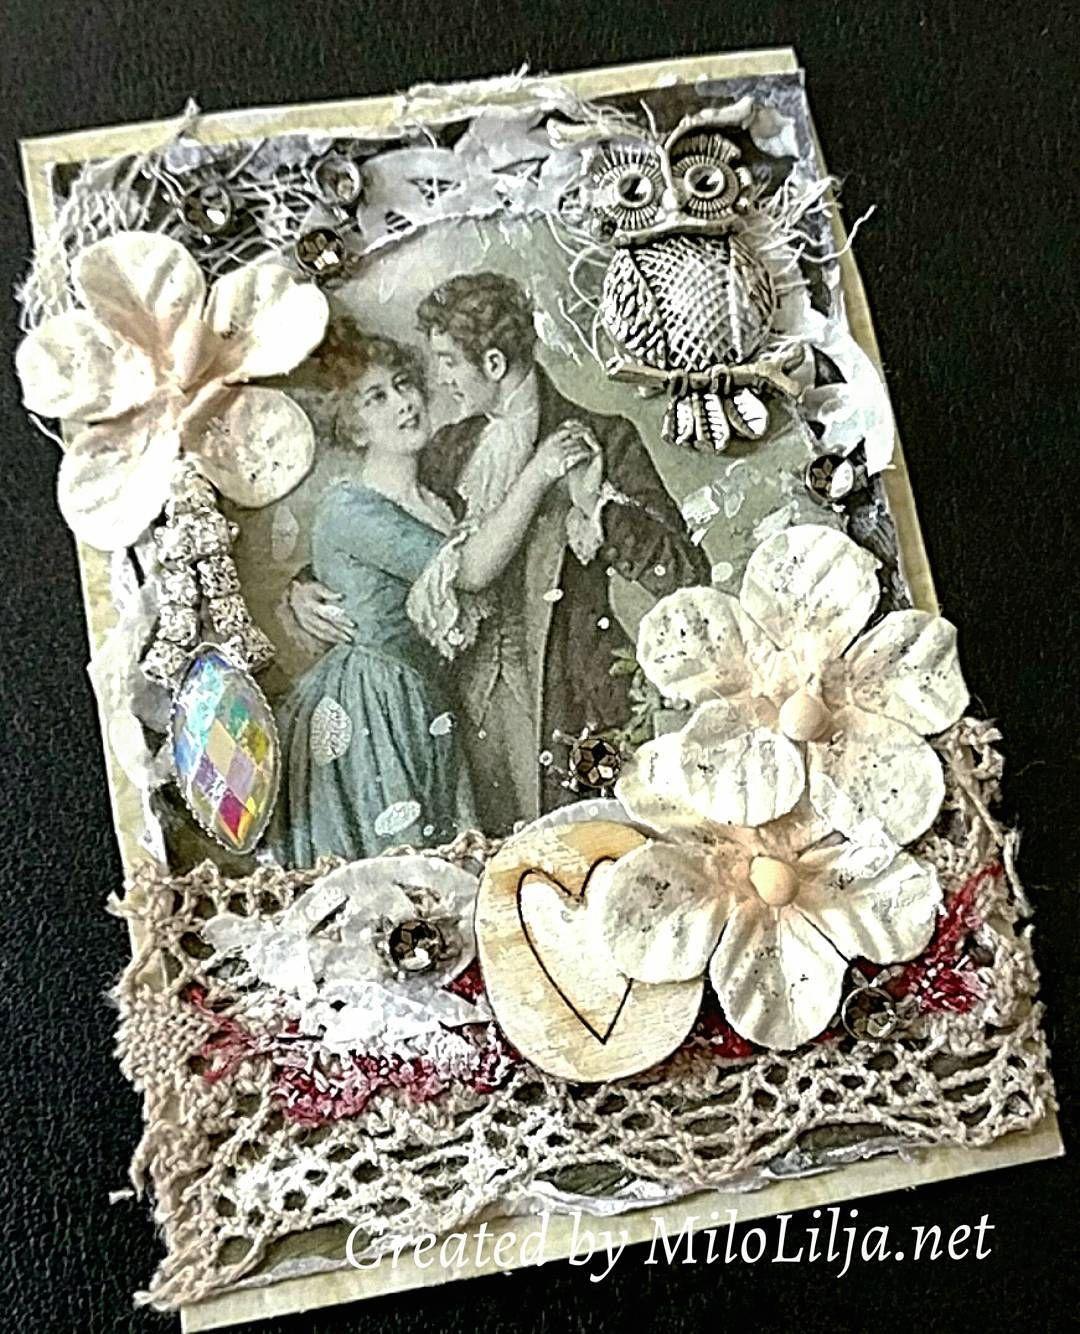 See all my ATC cards at: {#miloliljaartATC} {#miloliljaART} {#jewlery}   {#heart} {#owl} {#couple}   {#myart} {#scrapbooking} {#tarjetas} {#handmadecard} {#kortlaging} {#scrapping} {#instadaily} {#art} {#instaart} {#artist} {#masterpiece} {#paperart} {#crafting} {#creative} {#scraptop} {#vintage} {#shabbychic} {#mixedmedia} {#atc} {#atctrade} {#atccard} {#artisttradingcard} {#tradingcards} {#cardmaking}